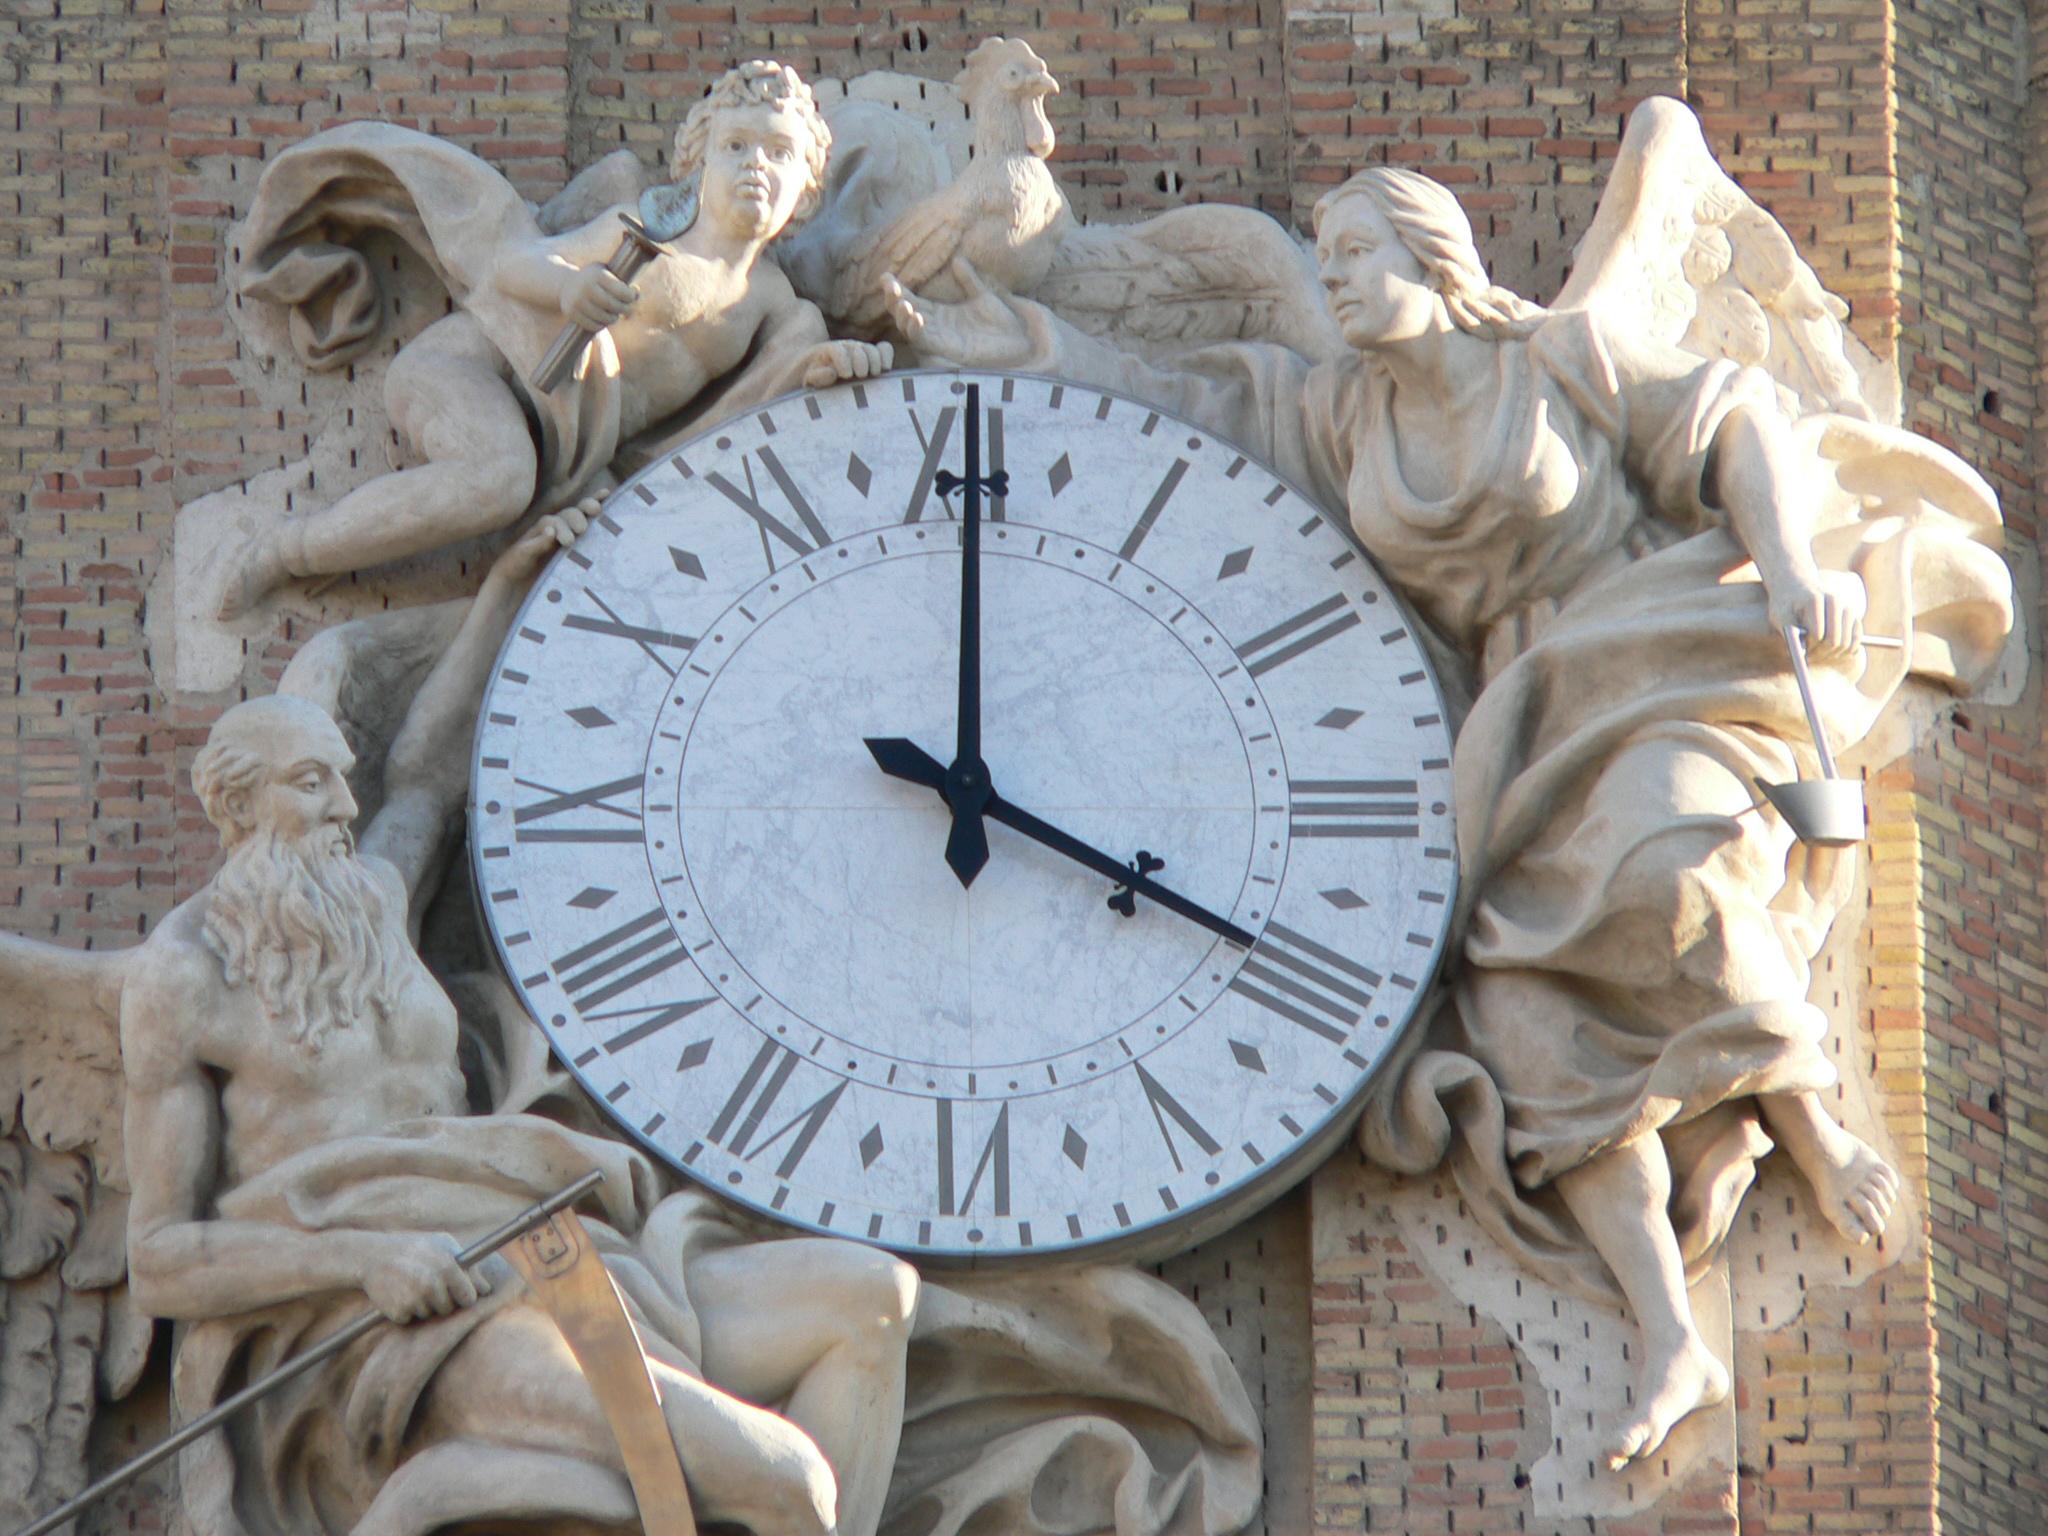 http://upload.wikimedia.org/wikipedia/commons/1/16/Reloj_de_La_Seo_Zaragoza.JPG